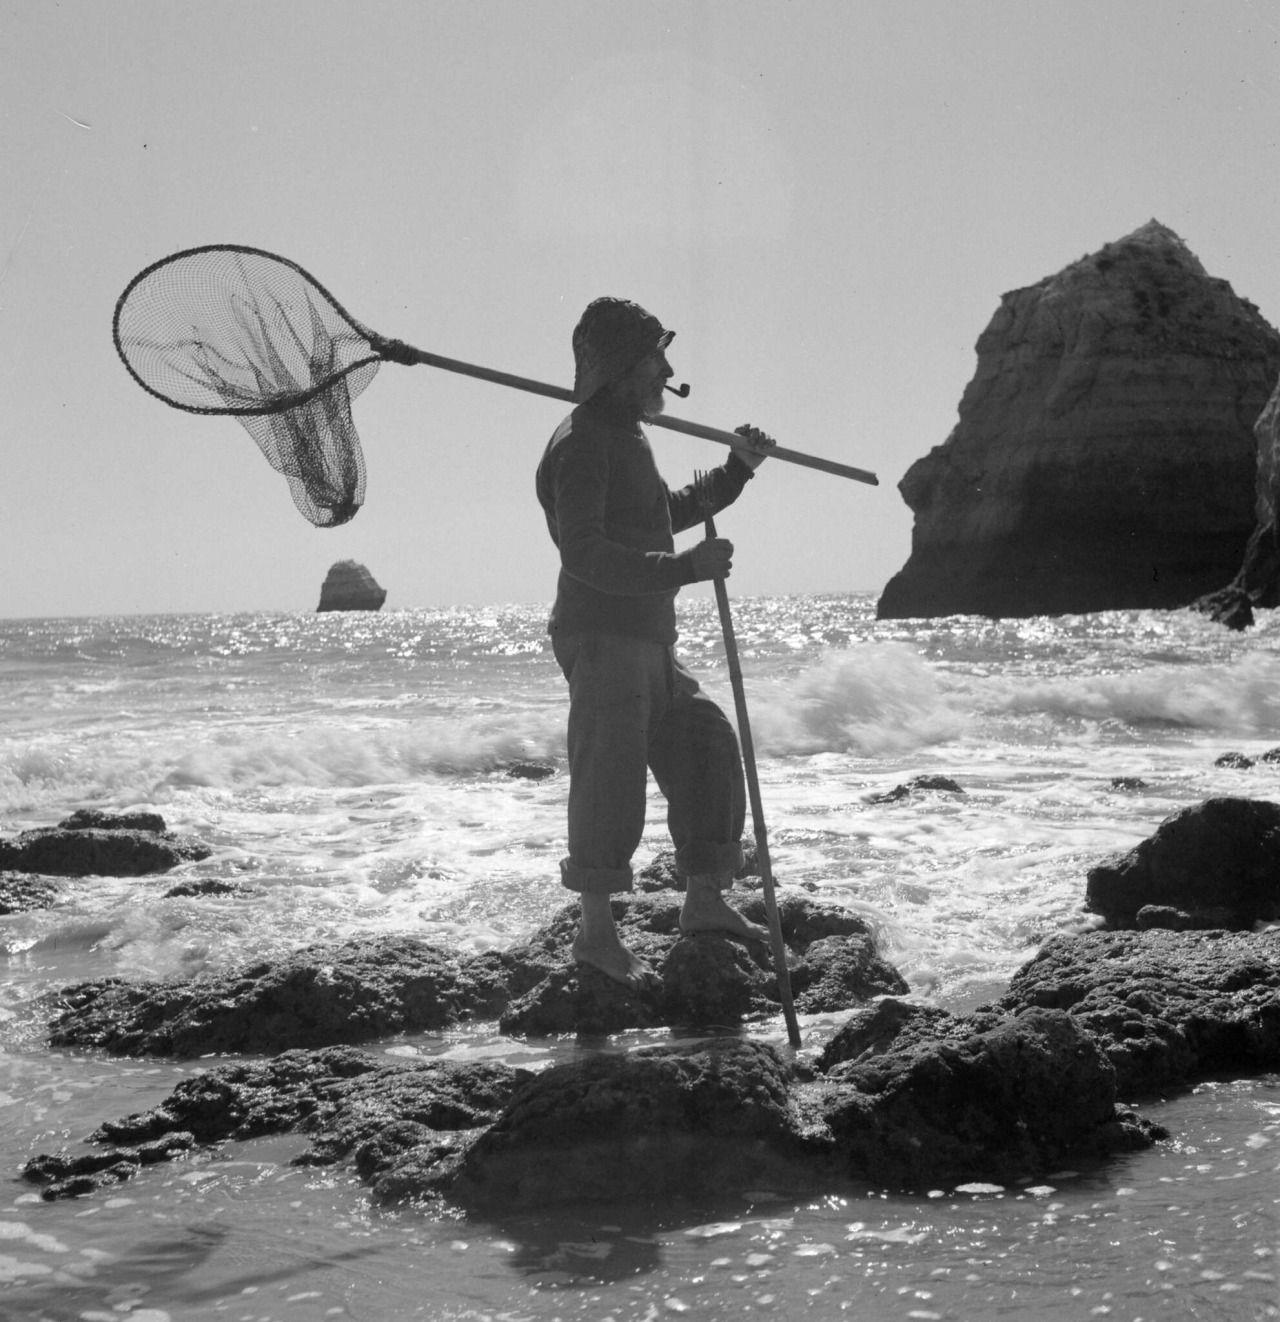 Algarve, Praia da Rocha. 1943/46.